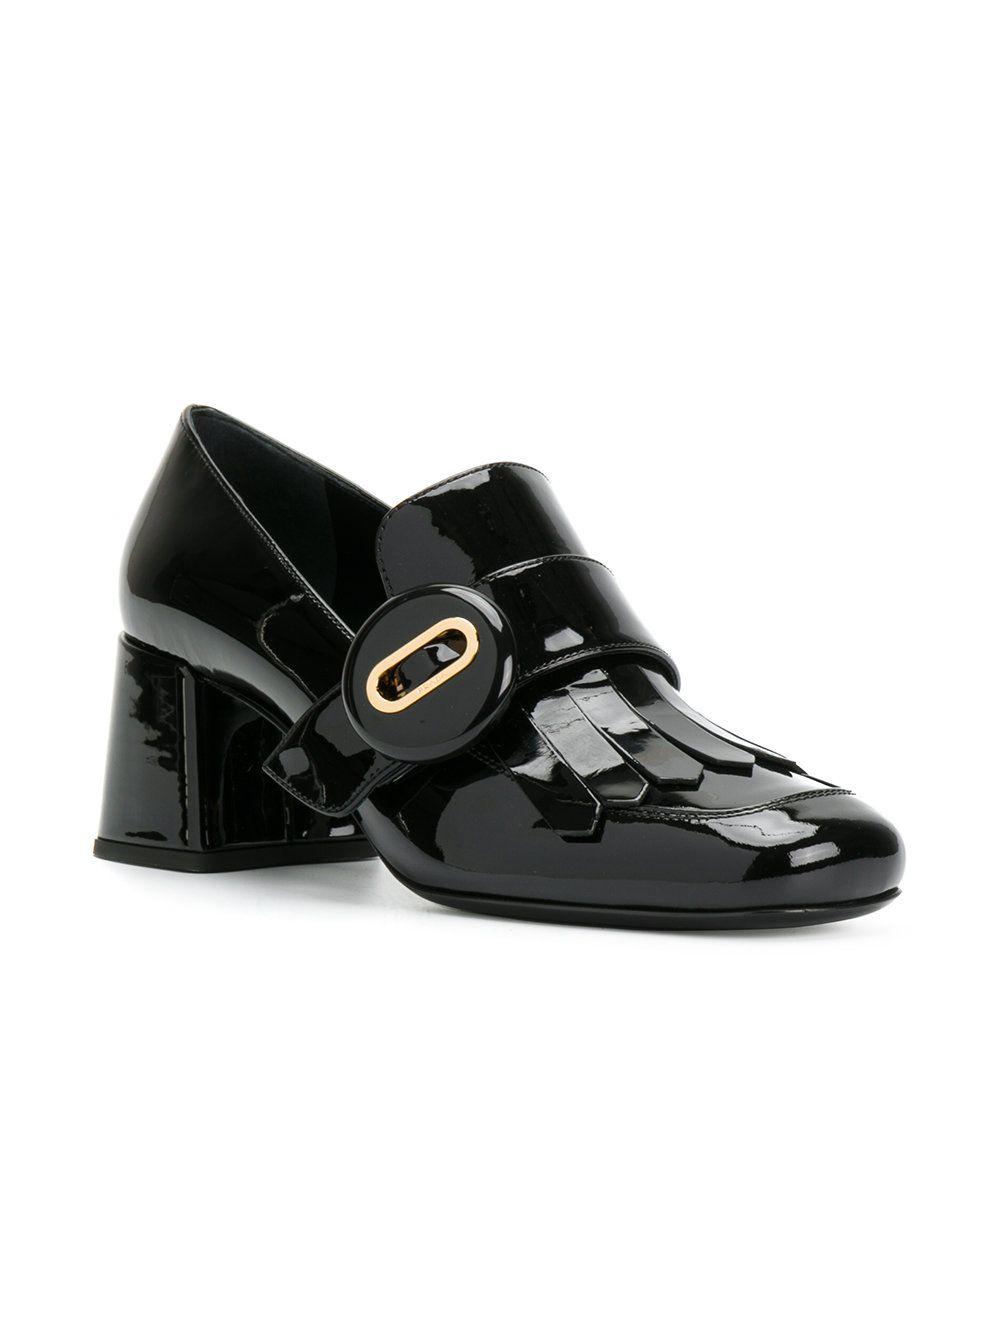 2adad9f0 Prada Patent Leather Heeled Loafers | maiko in 2019 | Block heel ...